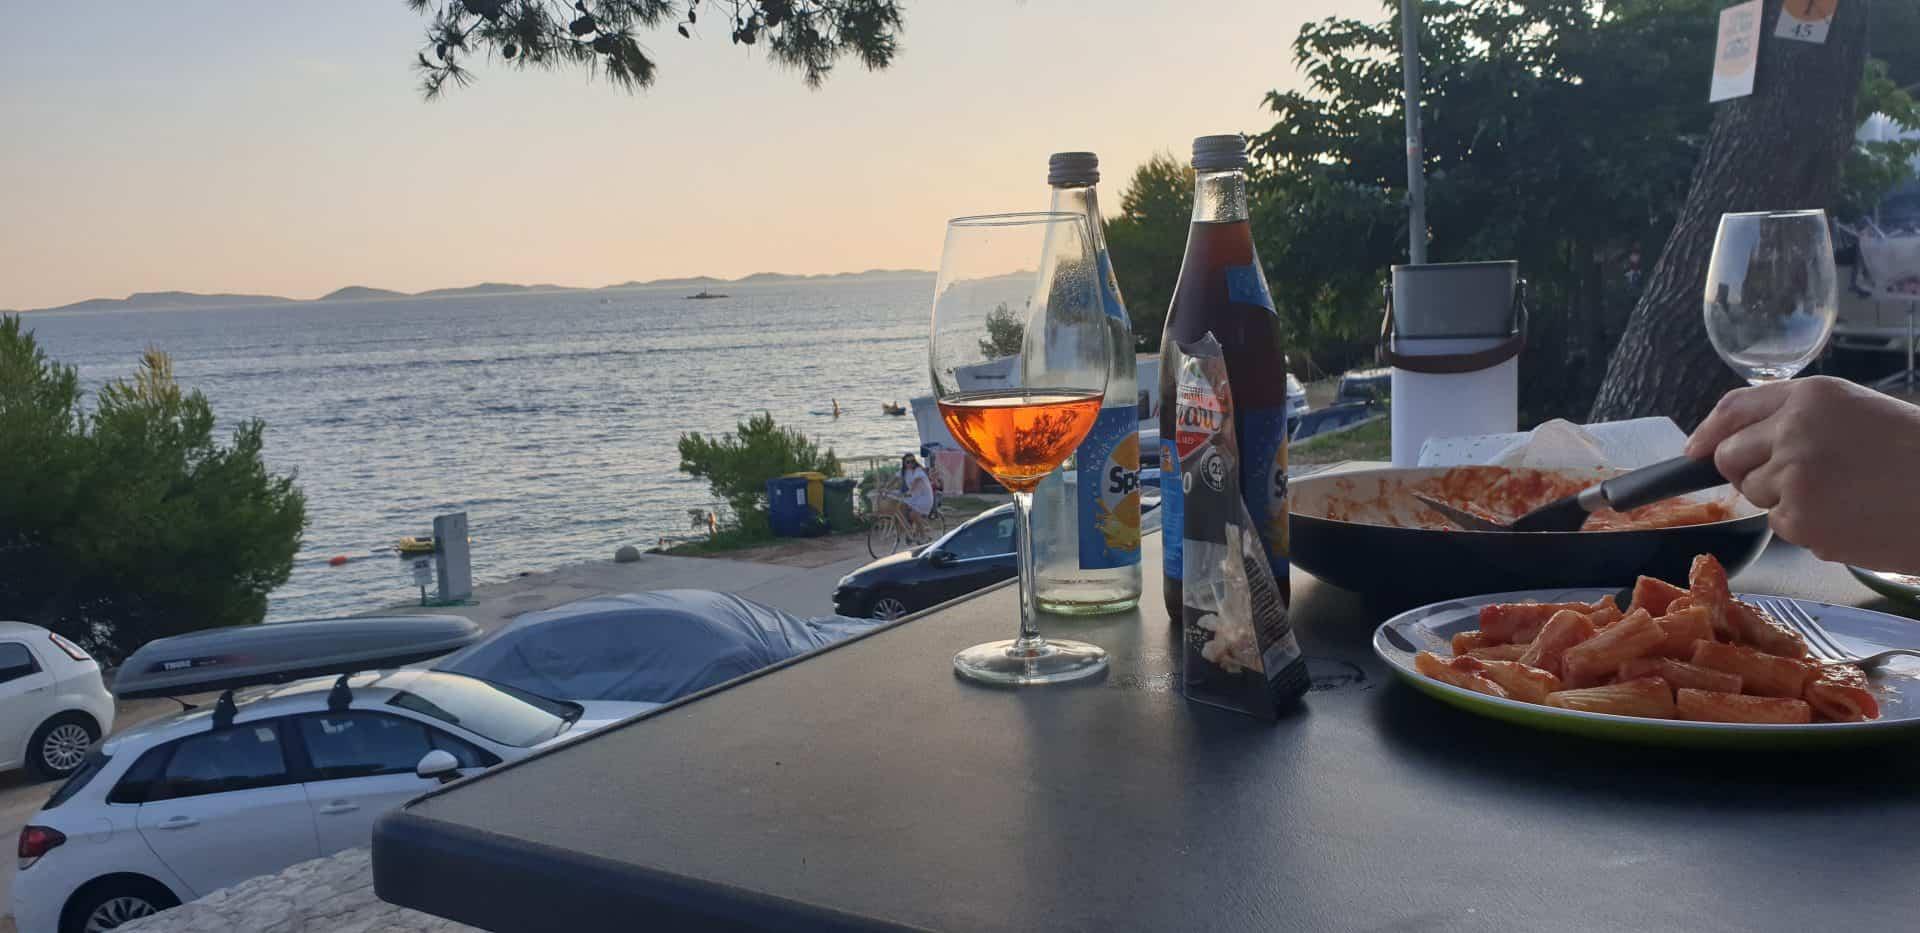 Test-Ratgeber-Top-5-Campingtisch-Christoph-Abendstimmung-Meer